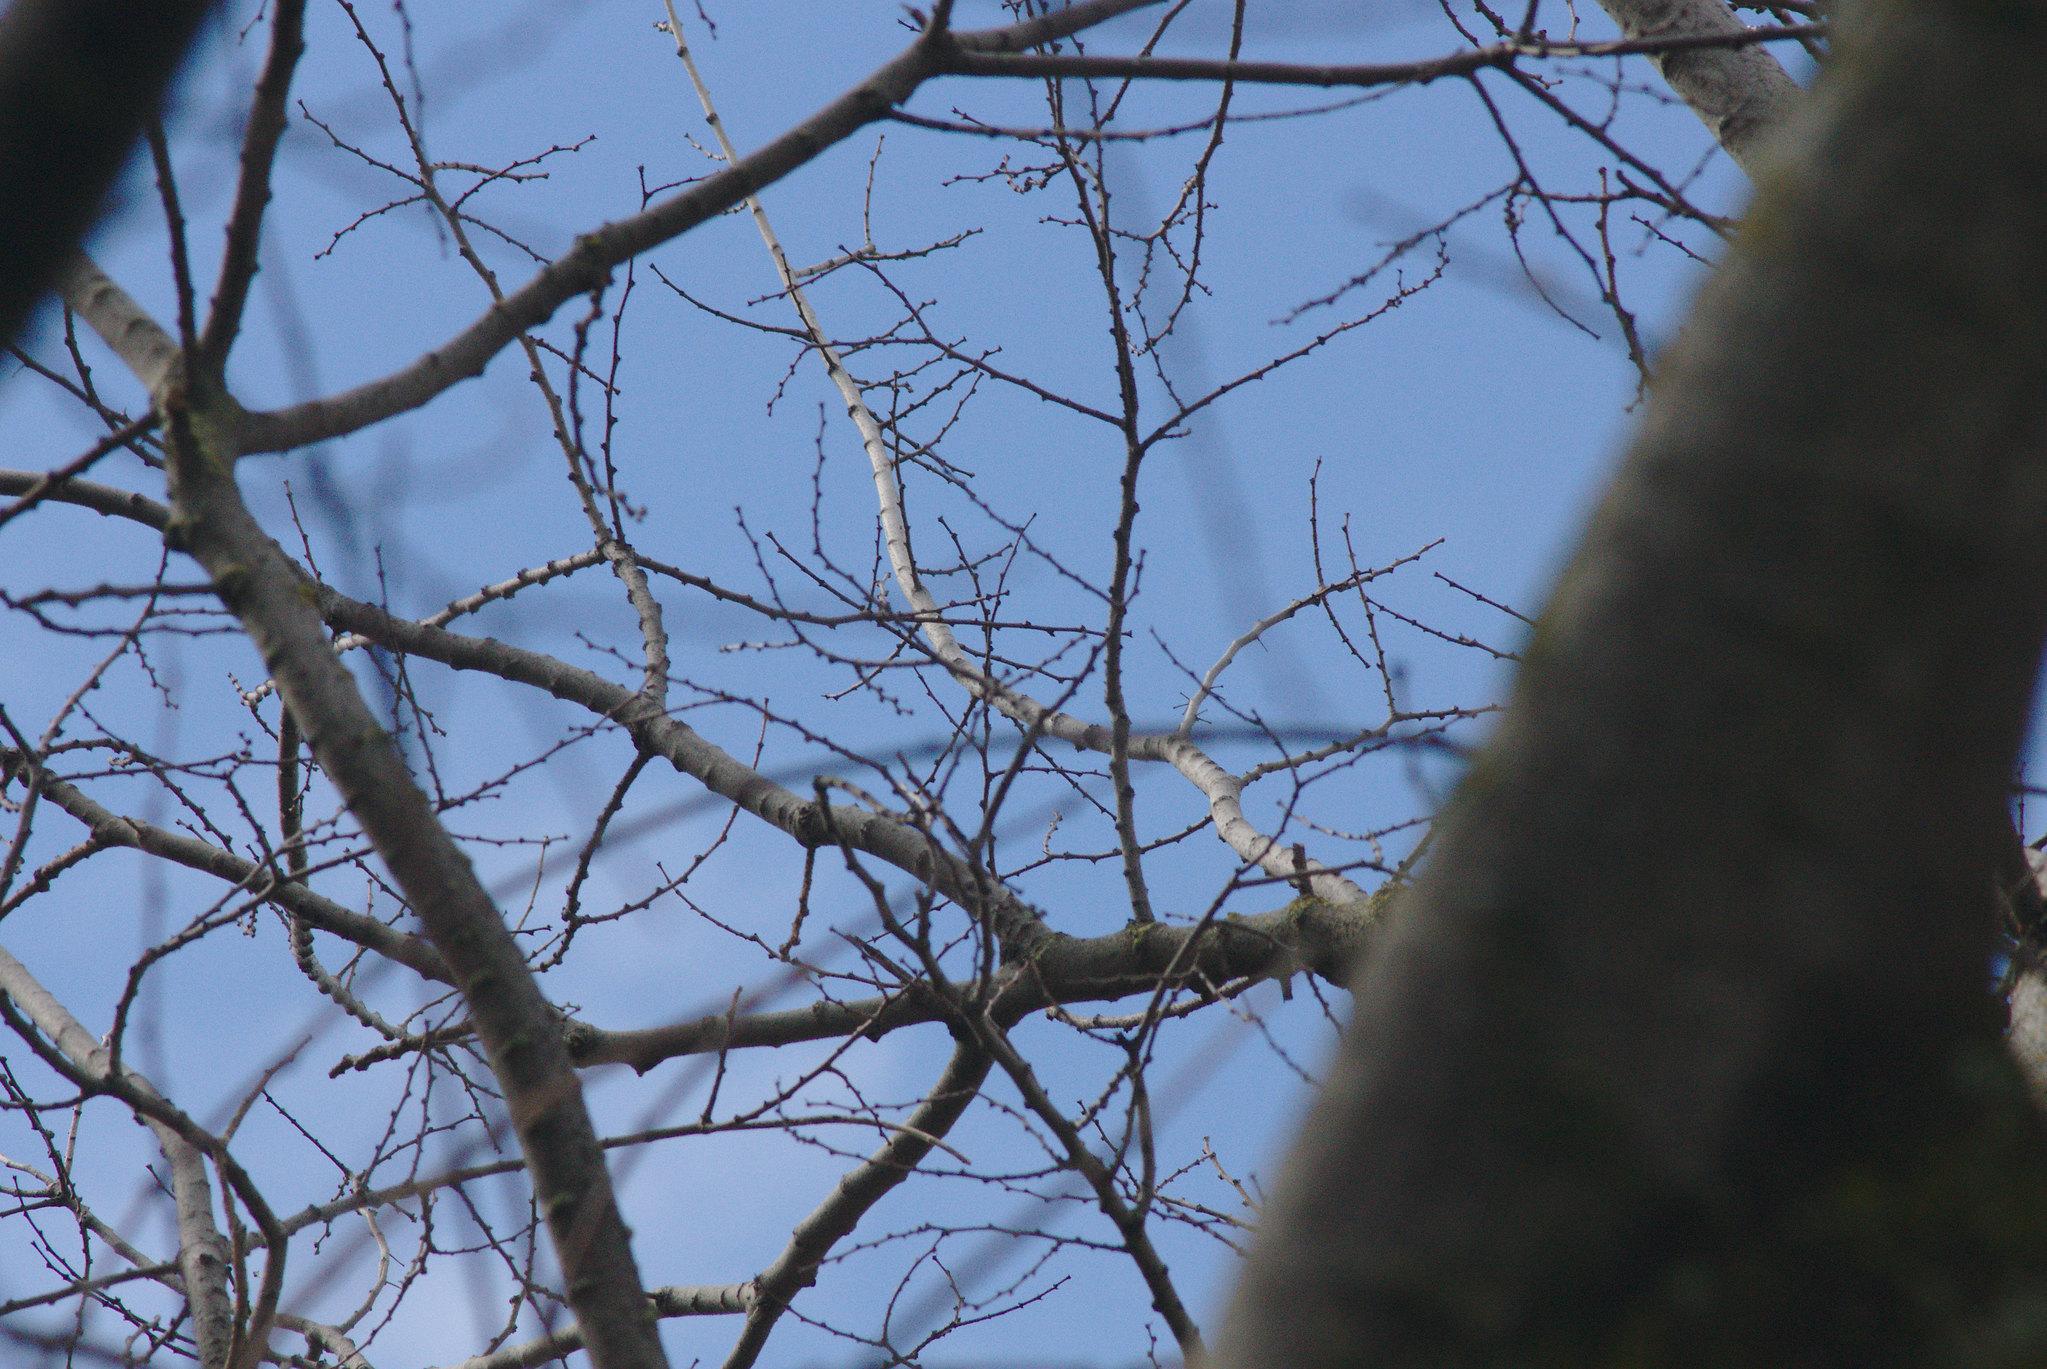 2017-02-18 Twigs Test - Take 8 [#5]